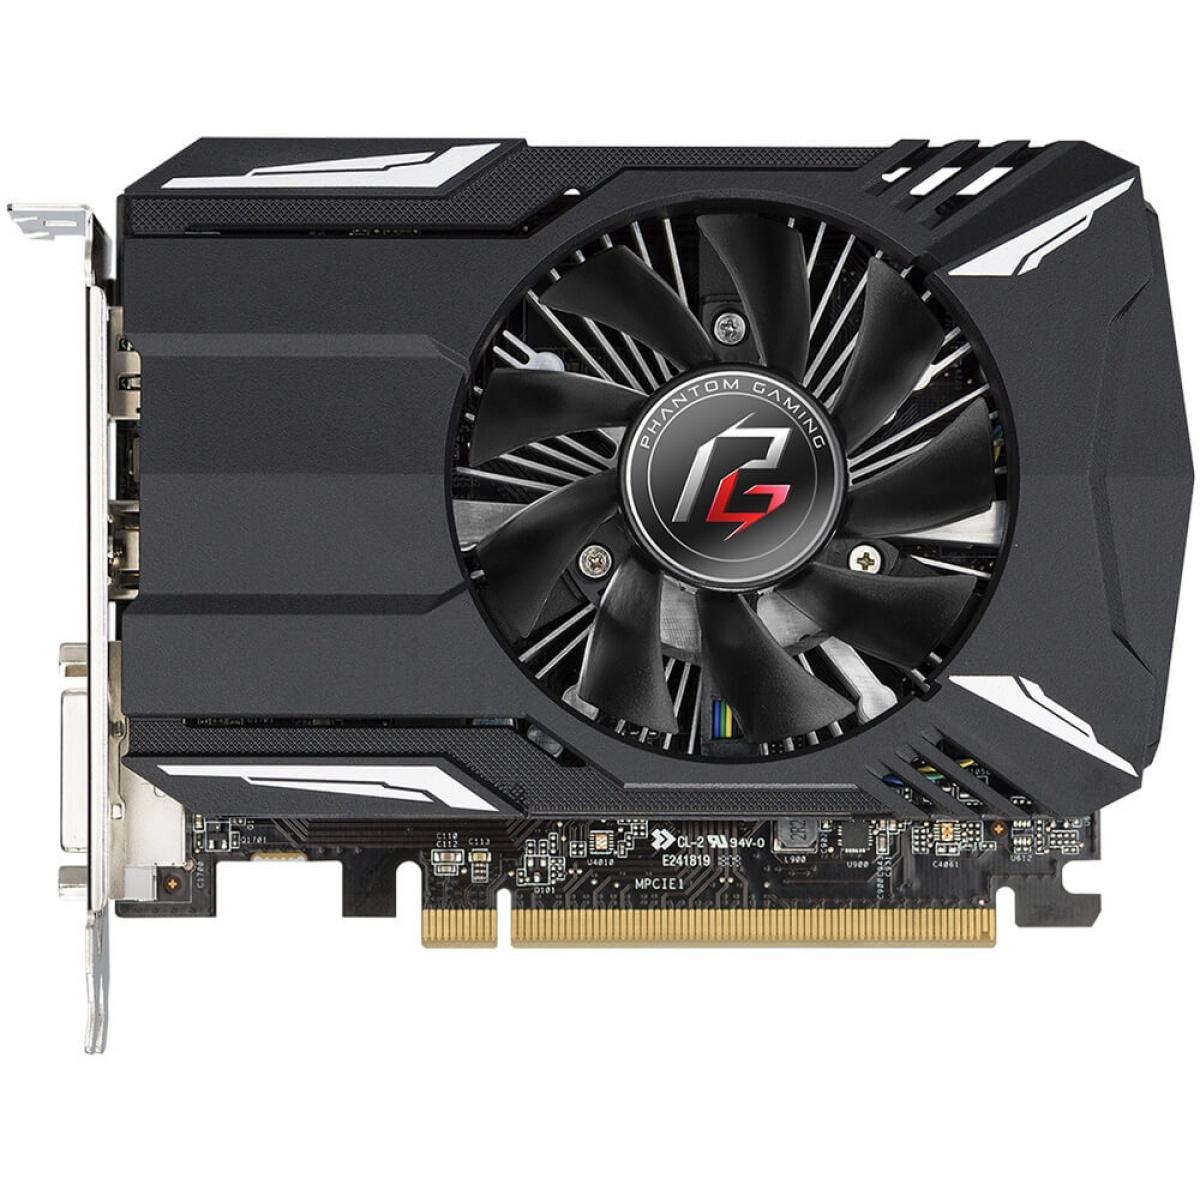 Placa de Vídeo Asrock, Radeon, RX 560 Phantom, 4GB, GDDR5, 128Bit, 90-GA0620-00UANF